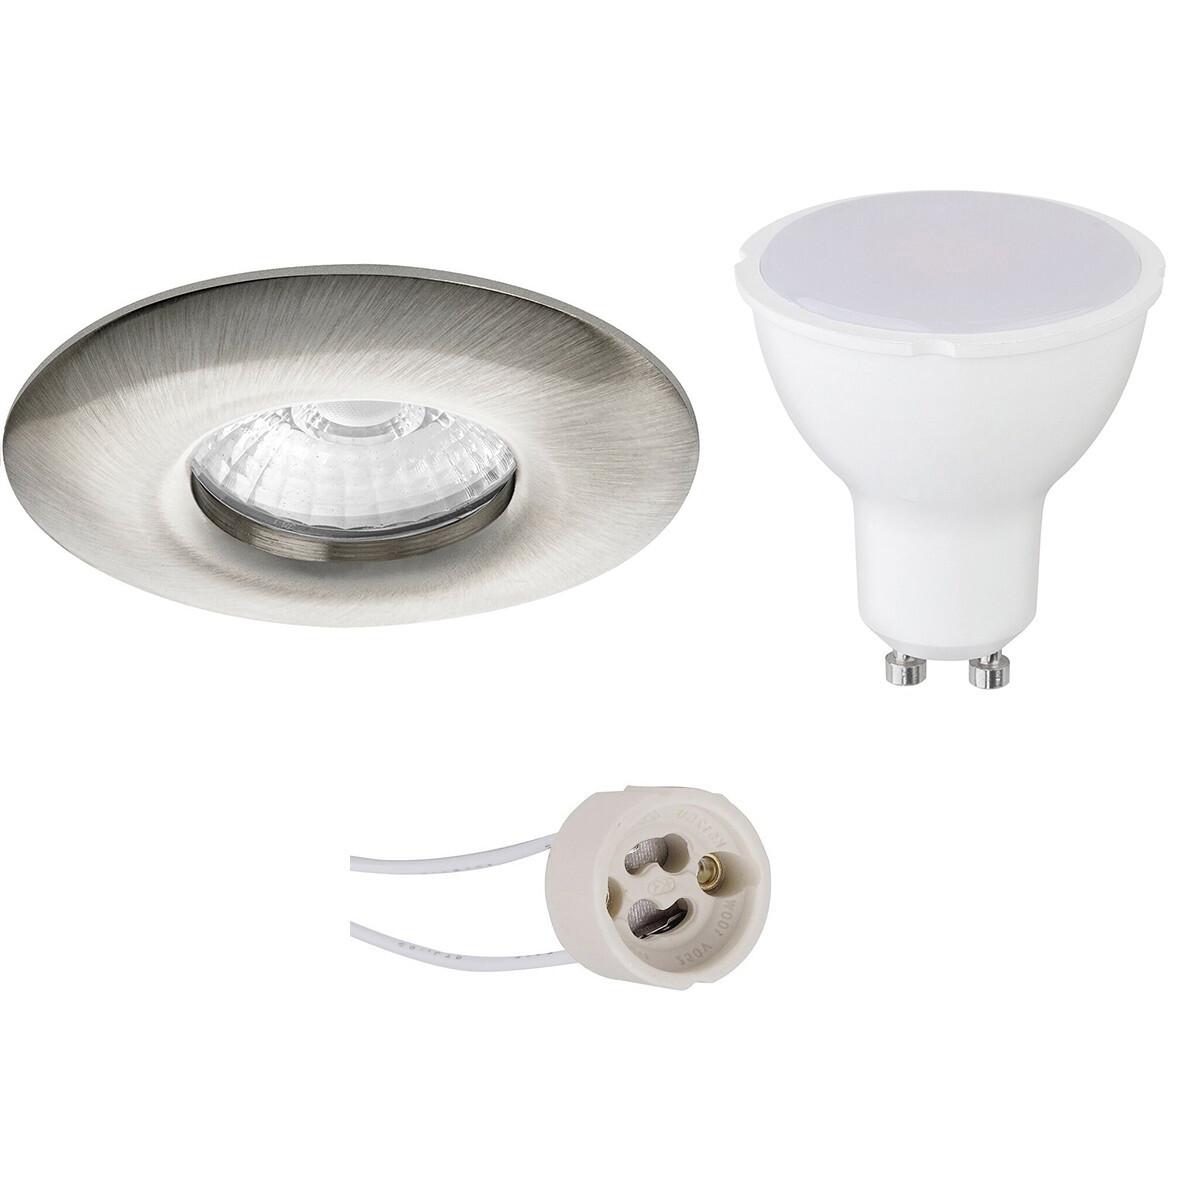 LED Spot Set - Pragmi Luno Pro - Waterdicht IP65 - GU10 Fitting - Inbouw Rond - Mat Nikkel - 6W - Wa